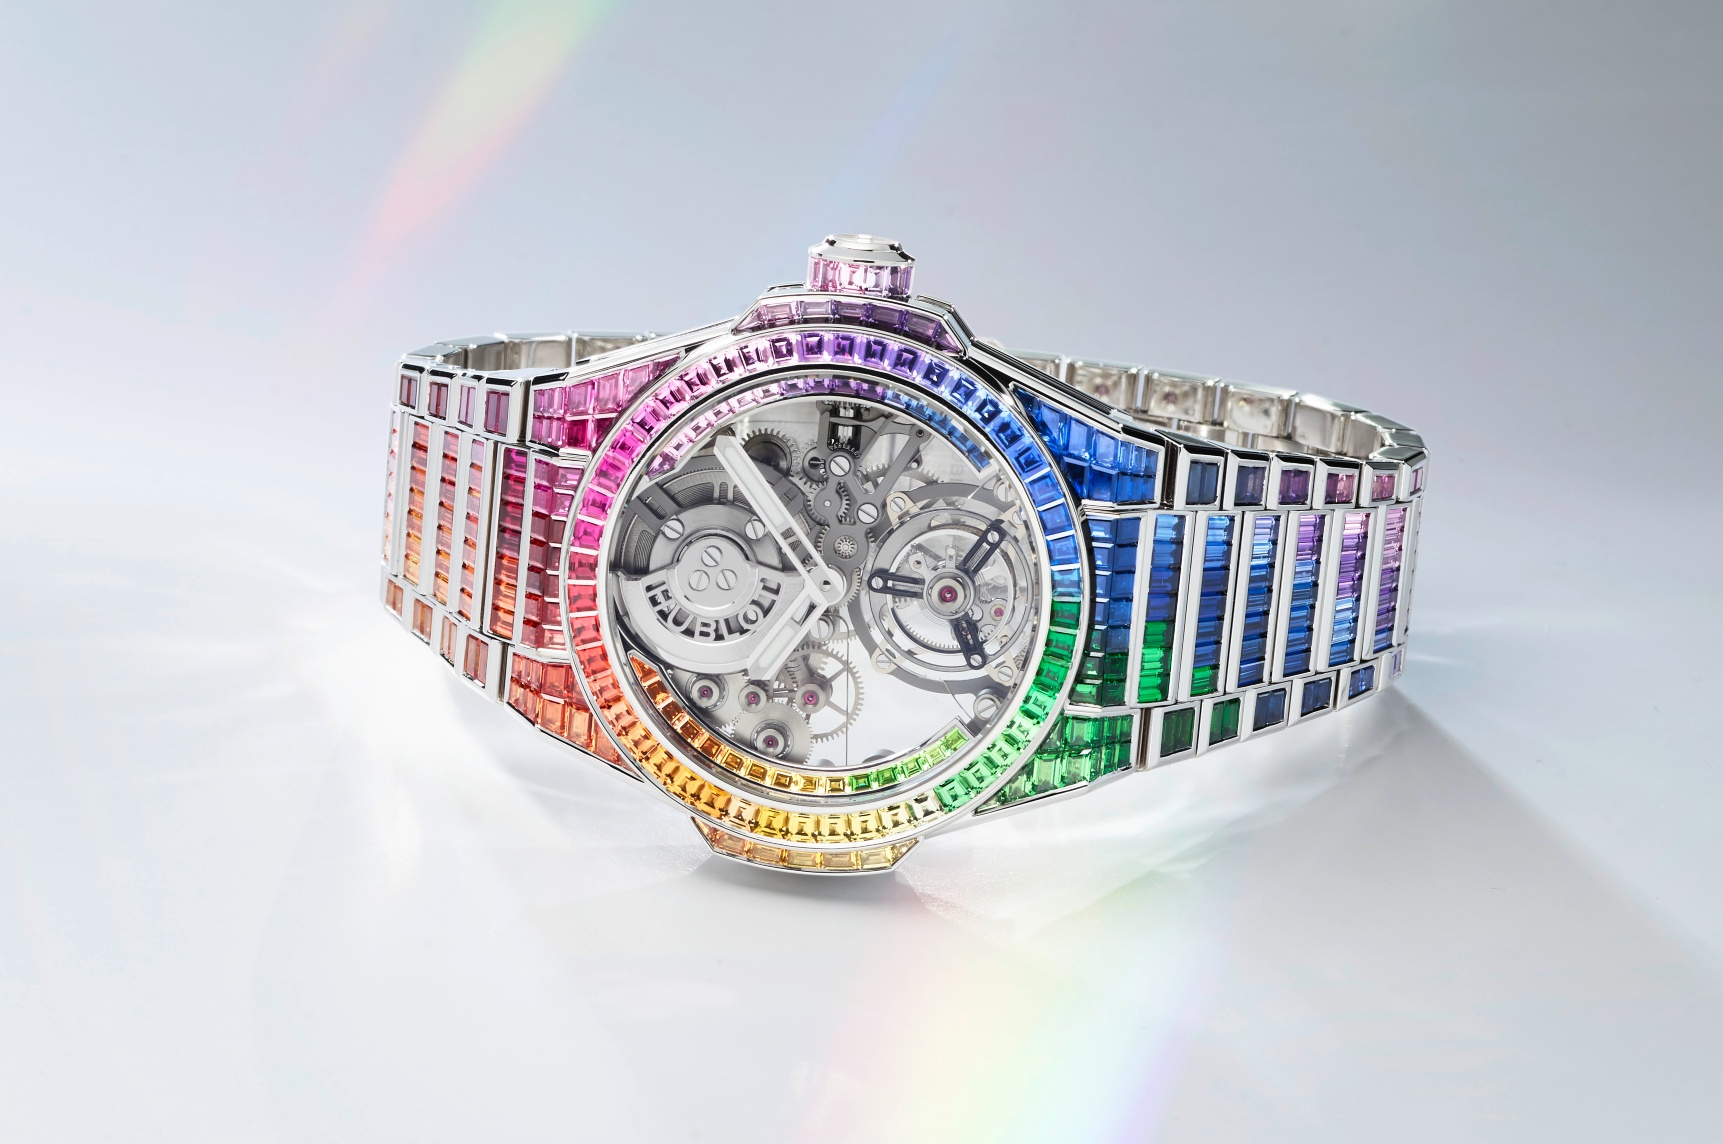 455 WX 9900 WX 9999 Big Bang Integral Tourbillon Rainbow